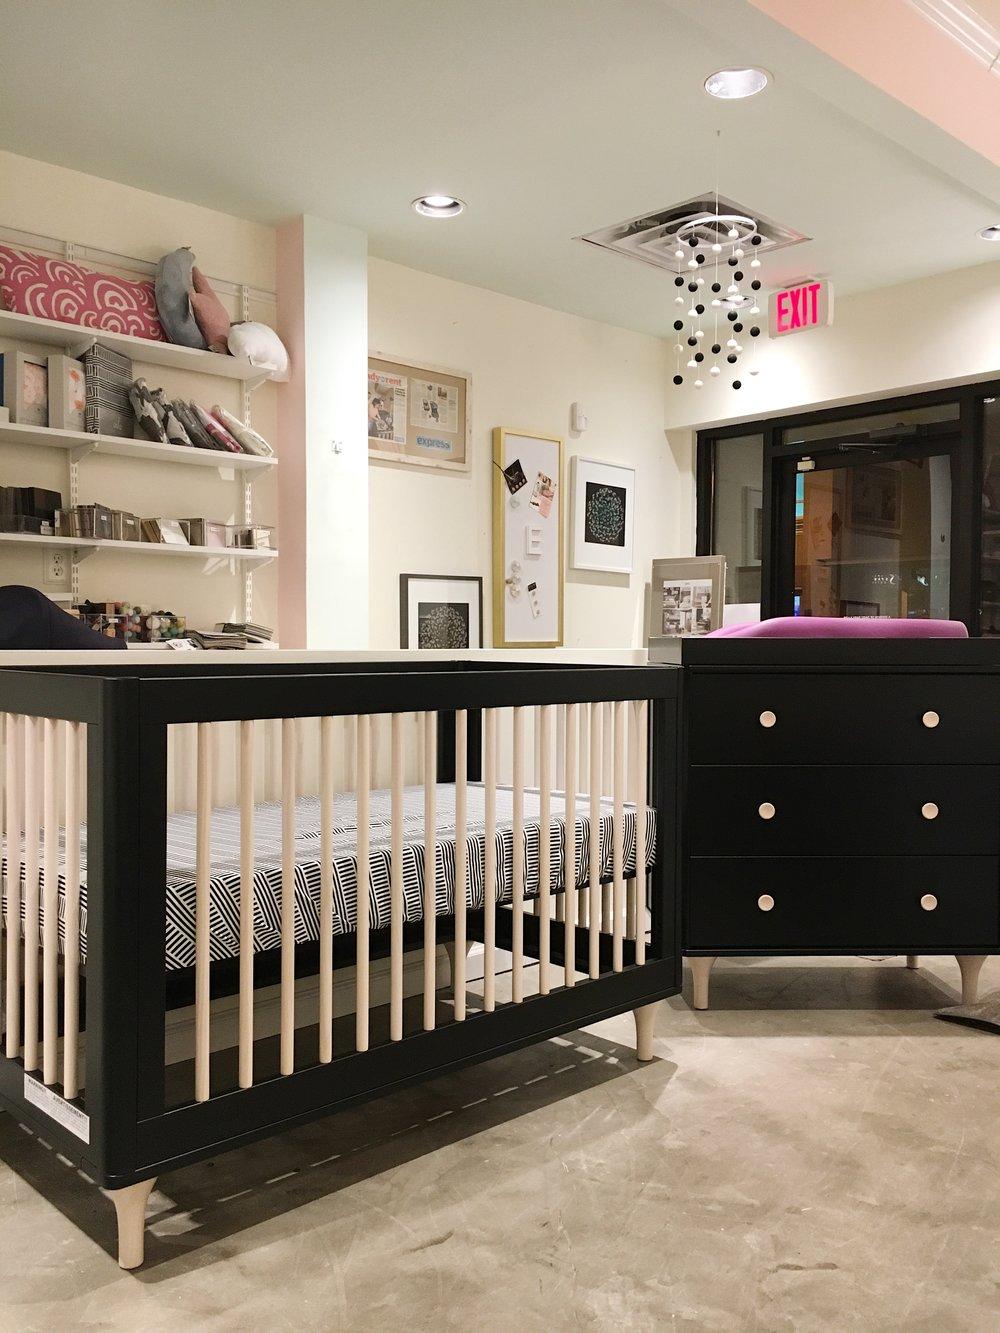 Babyletto Lolly Crib & Dresser